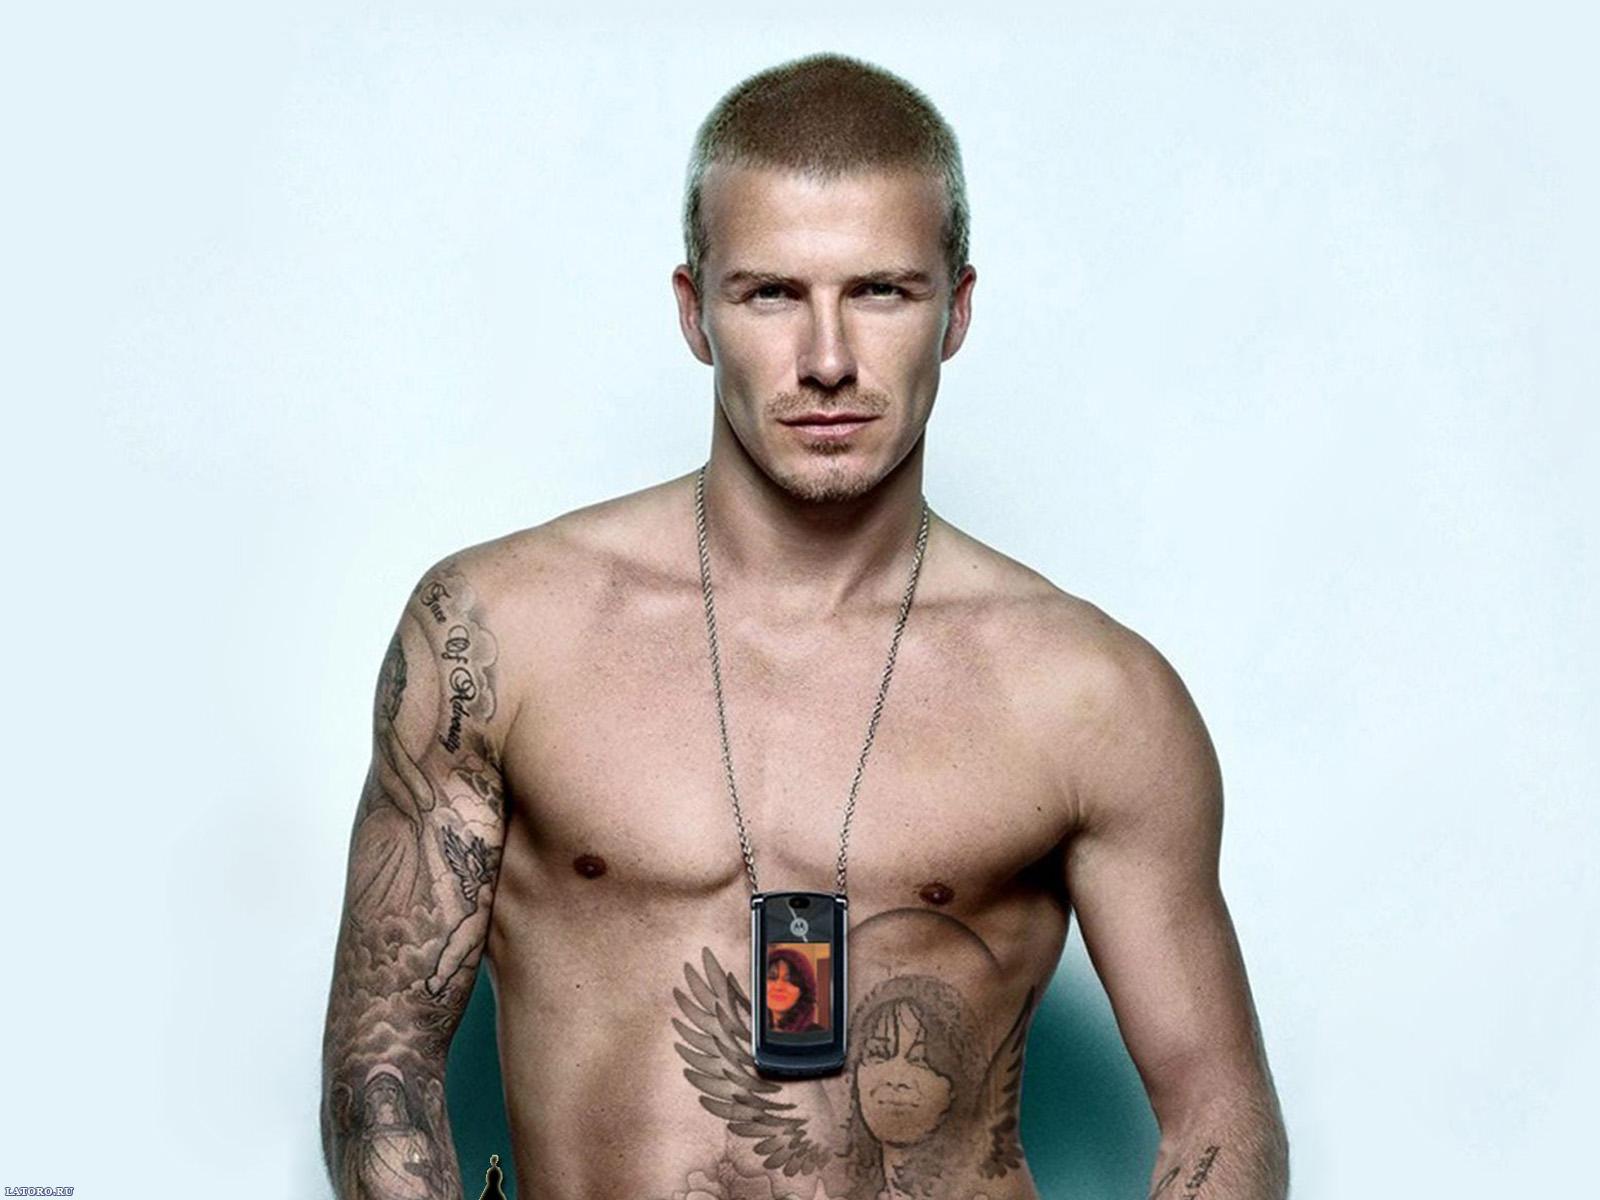 http://4.bp.blogspot.com/-YYXUQ2vfRyM/UTCn4XAxRNI/AAAAAAAA1q8/52zzESulg78/s1600/david-beckham-tattoos.jpg